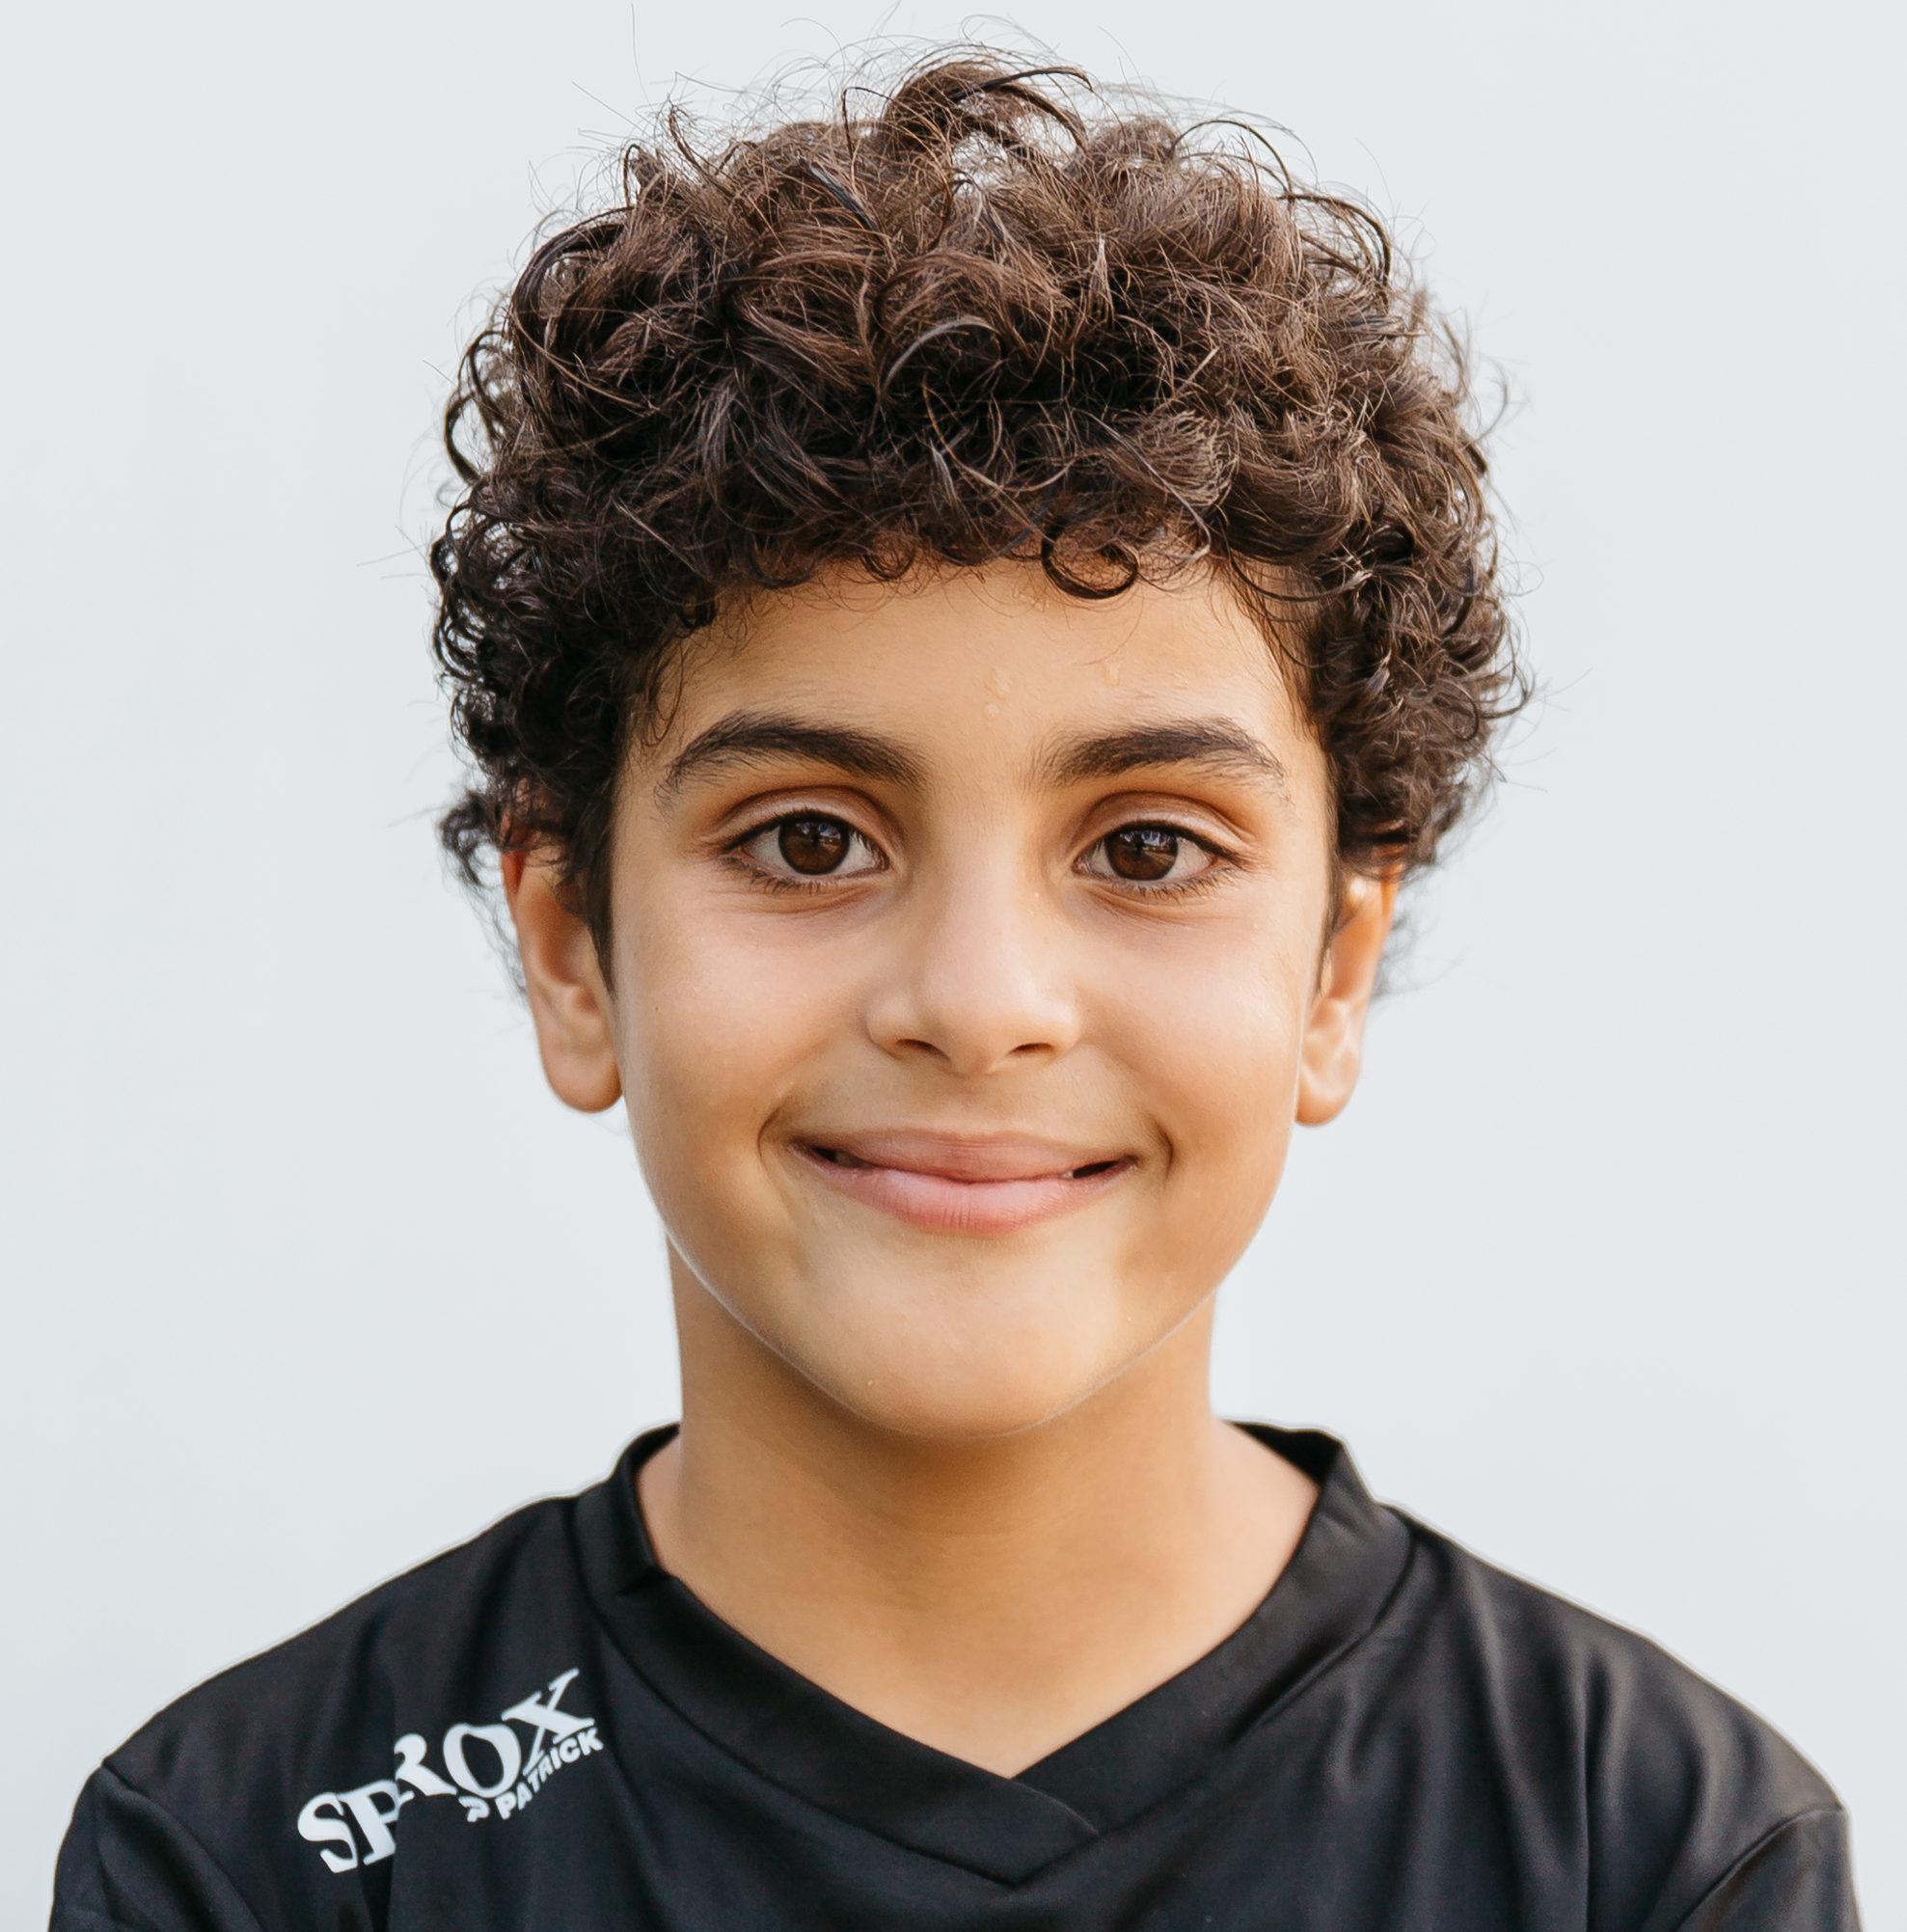 https://socceracademybreda.nl/wp-content/uploads/2017/05/SAB-Ouajid-1-e1568185187802.jpg